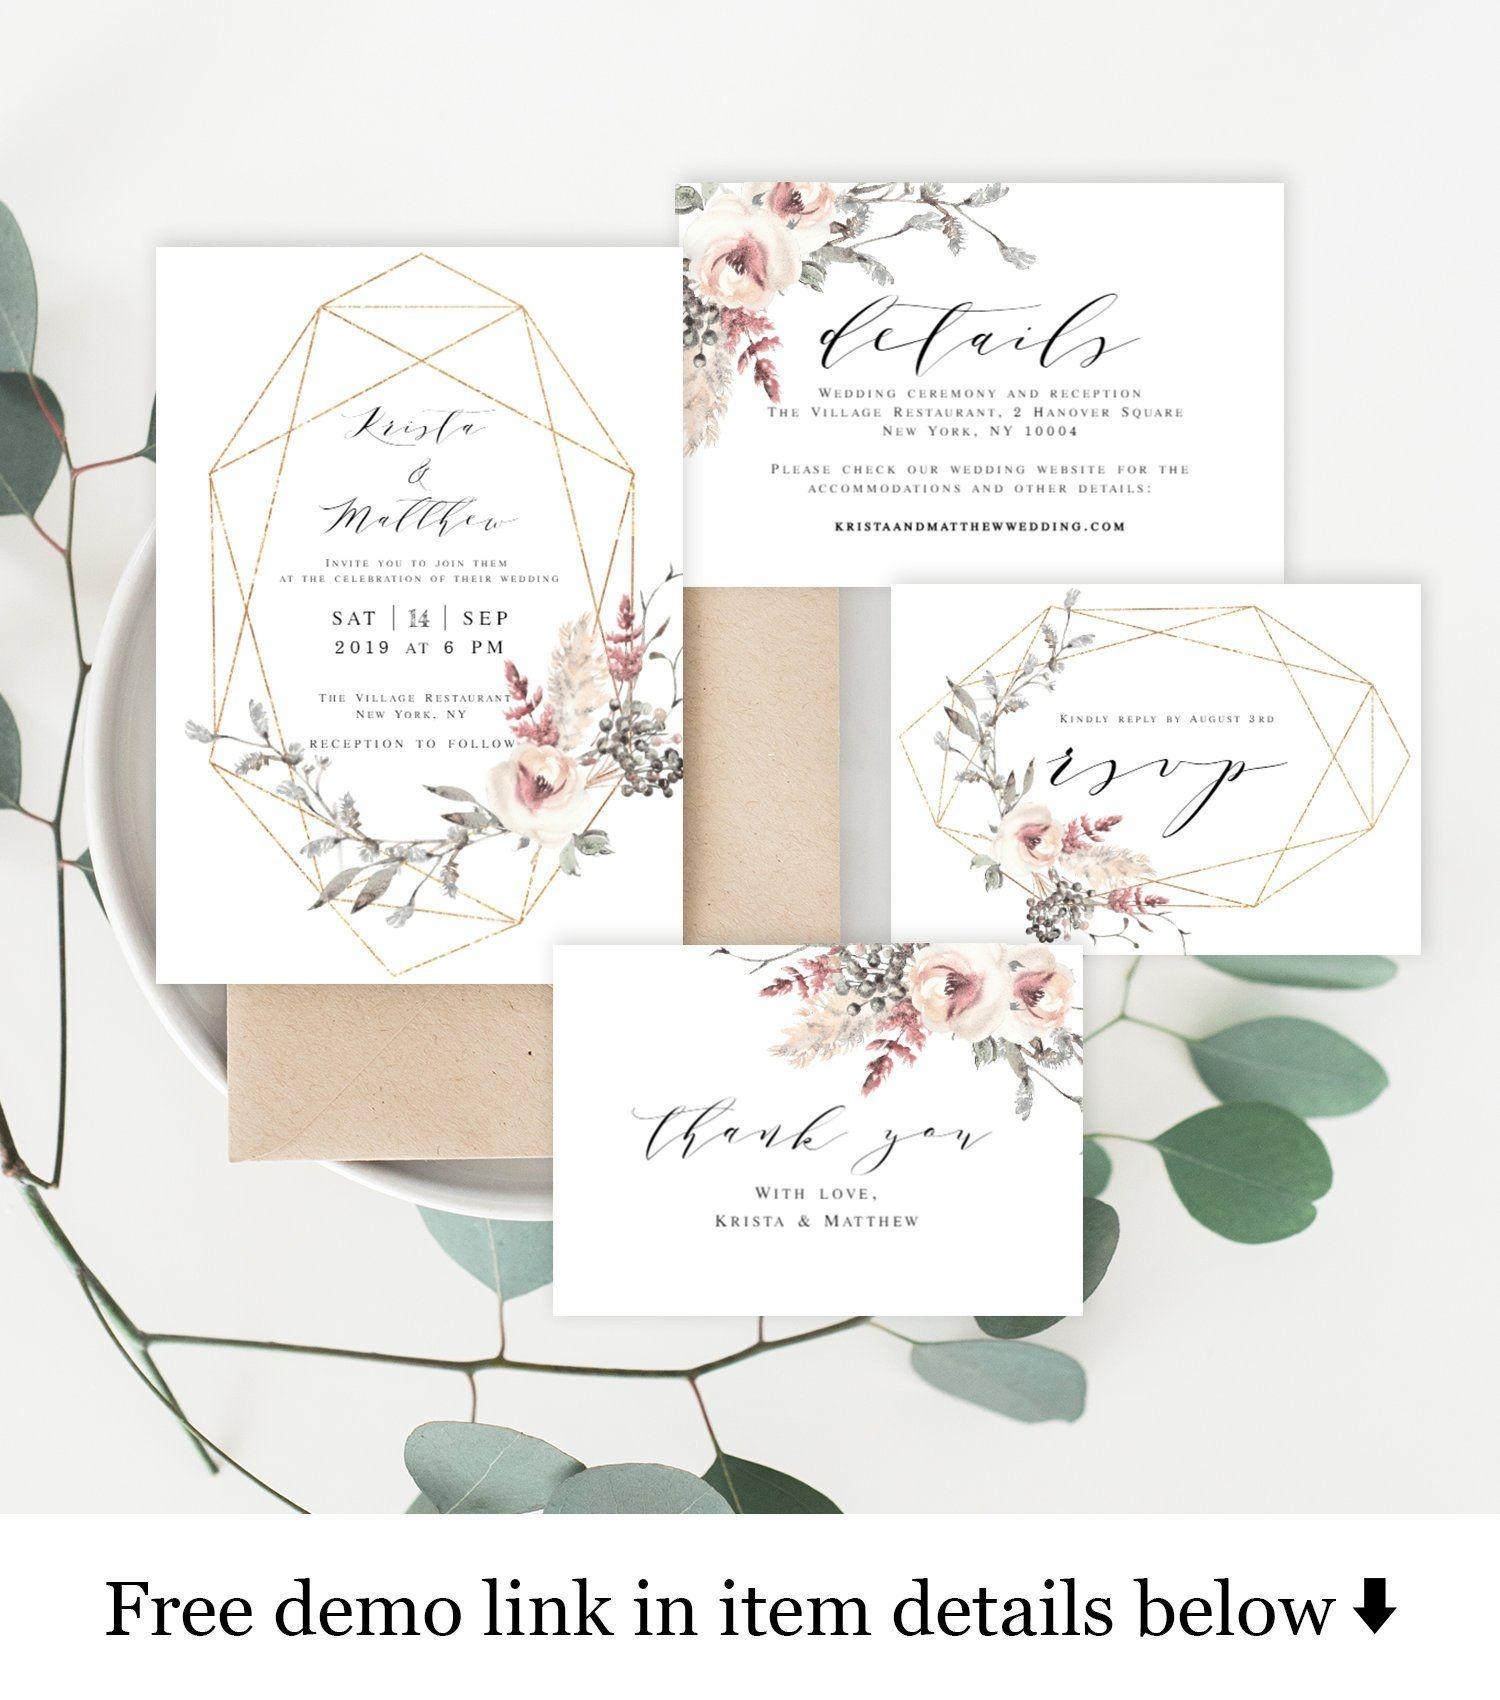 Wedding Invitation Kit Invite Template 100% Editable Unlimited Diy - Free Printable Enclosure Cards